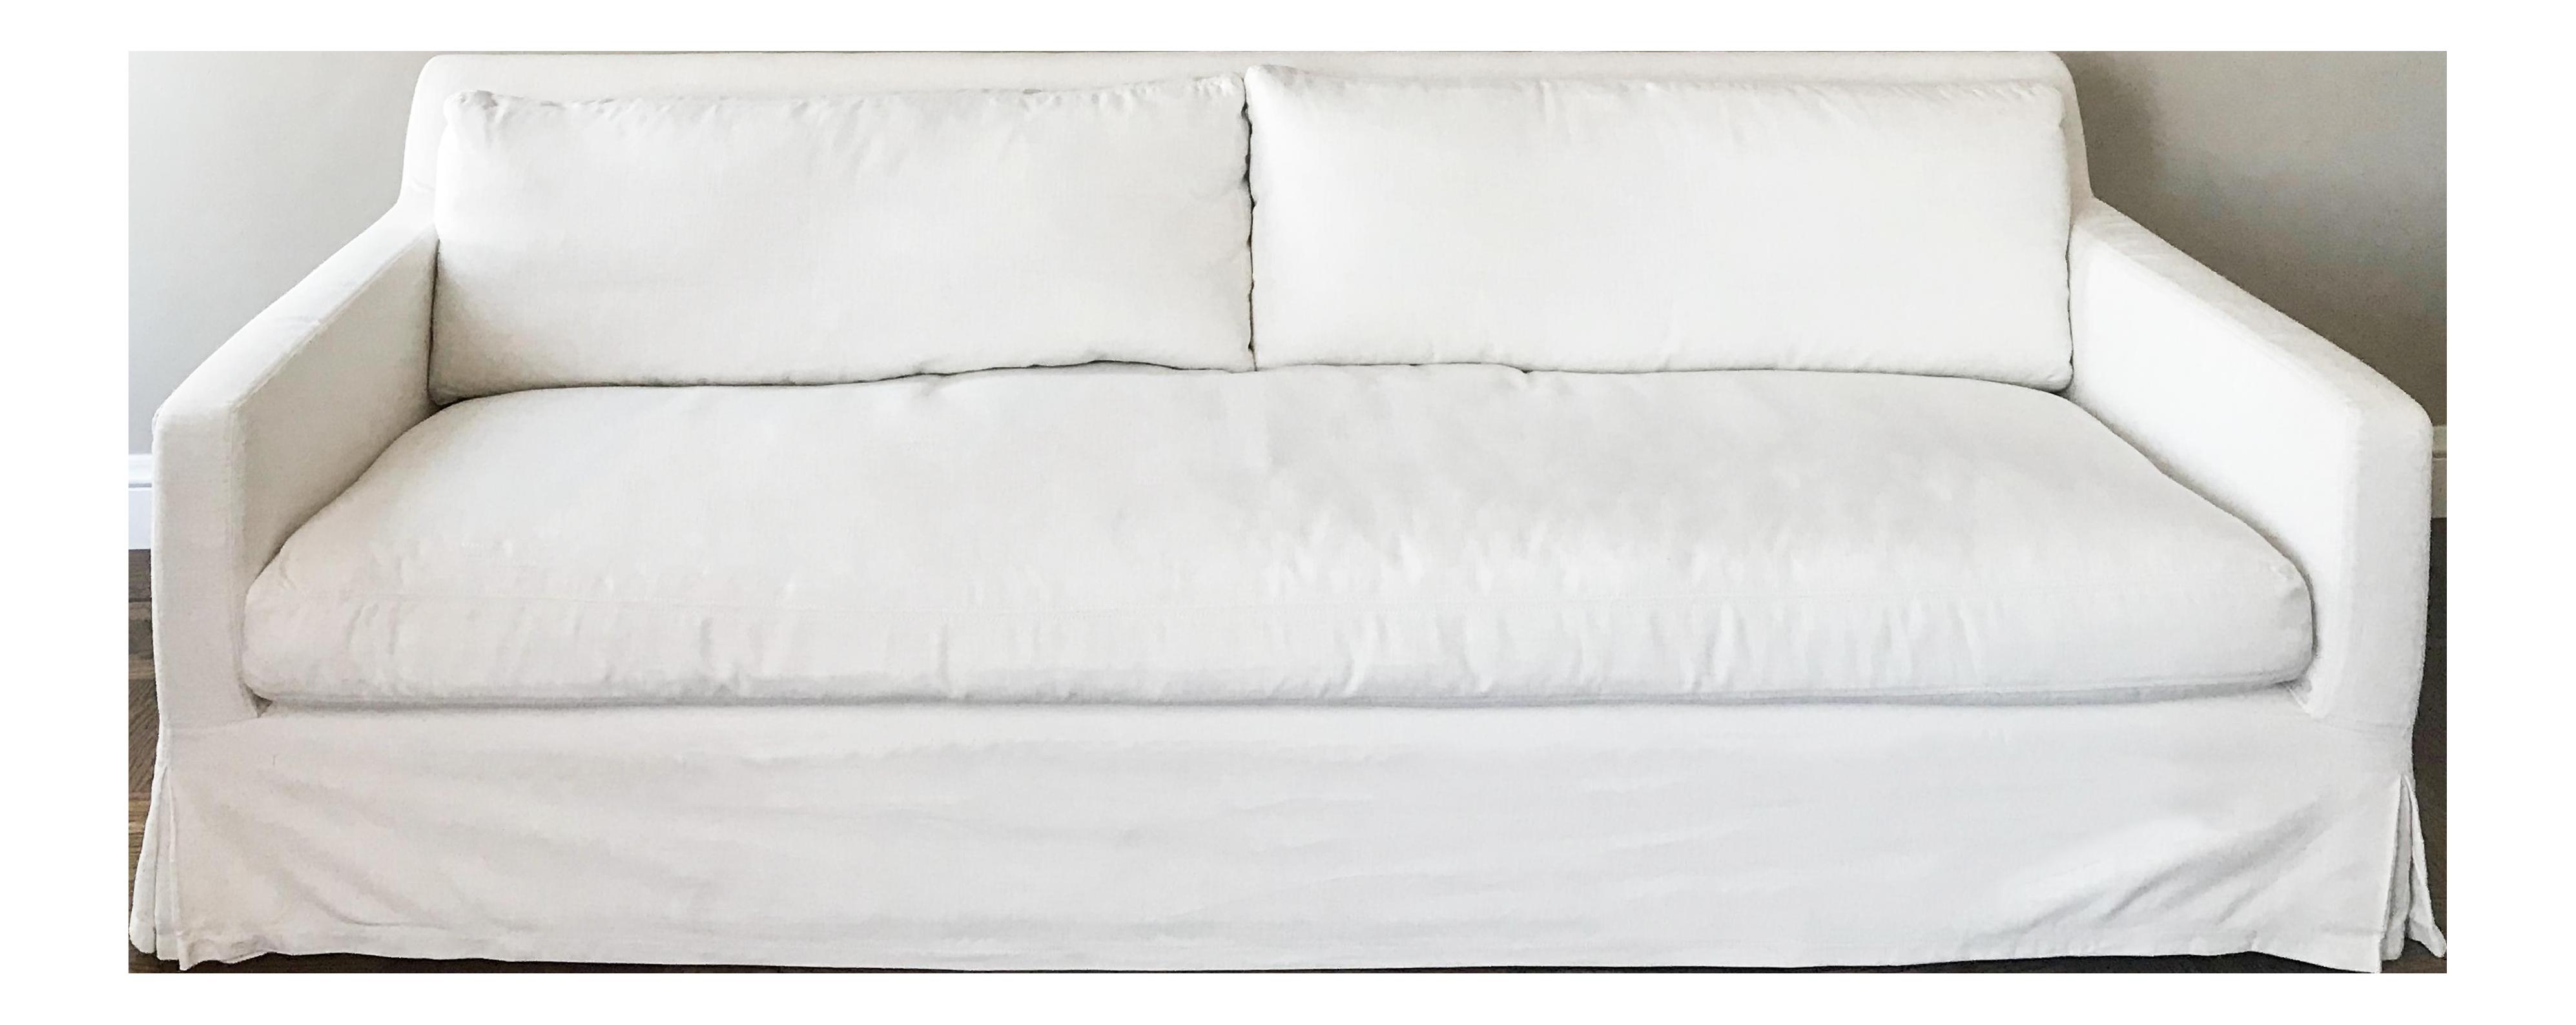 Restoration Hardware Sofa Belgian Track Arm Slipcovered 7 in White